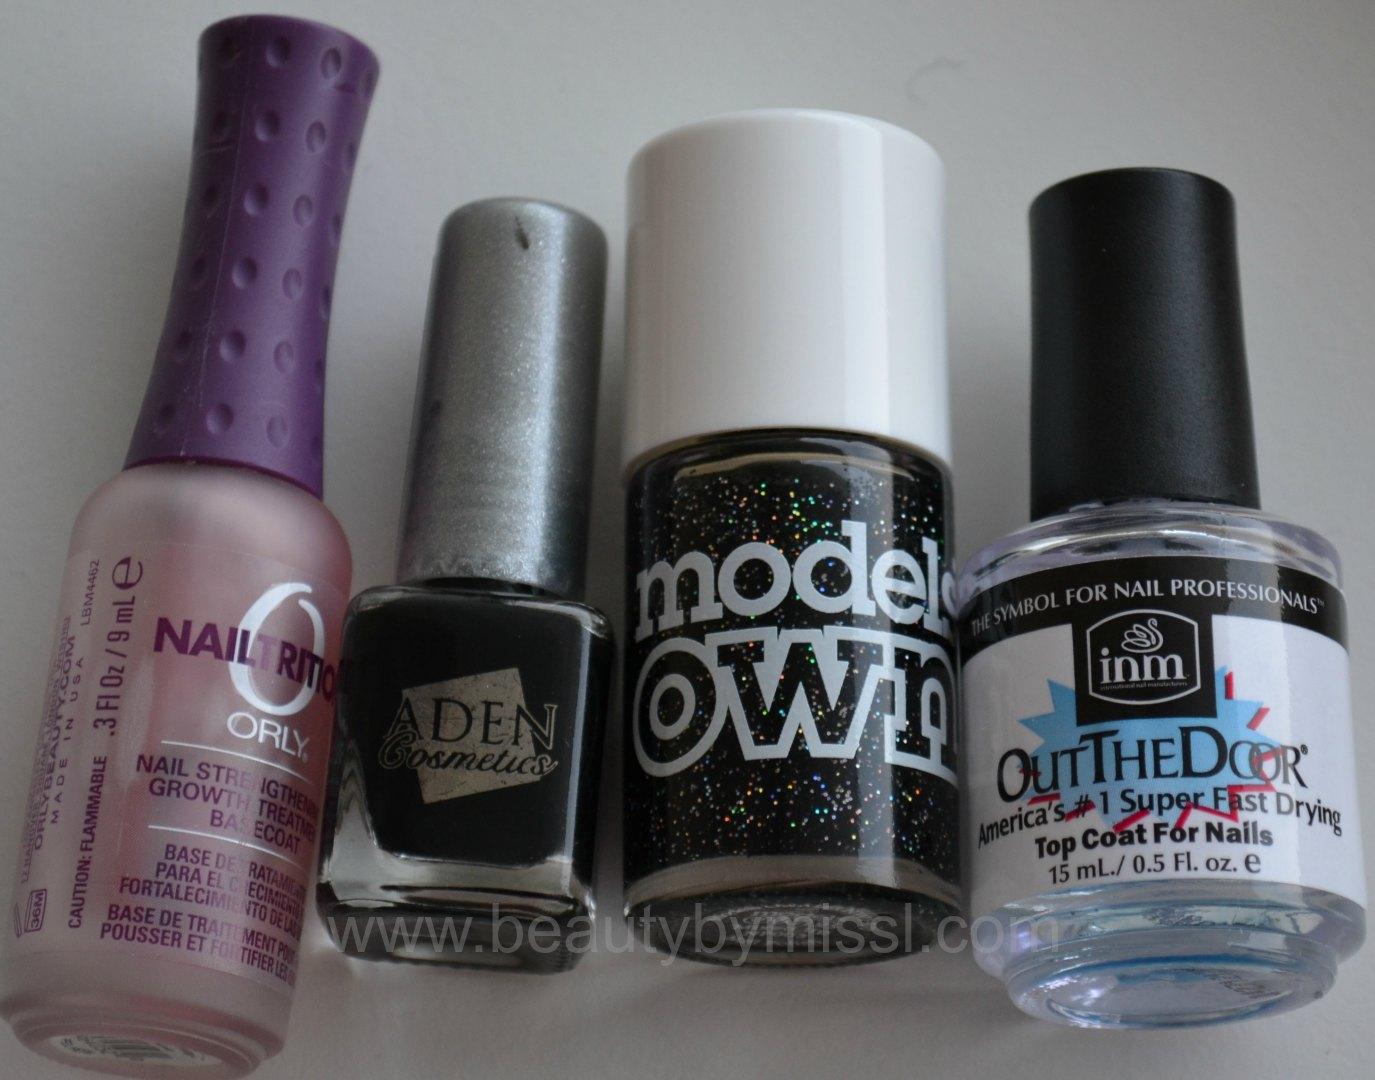 orly, aden cosmetics, models own, INM OTD